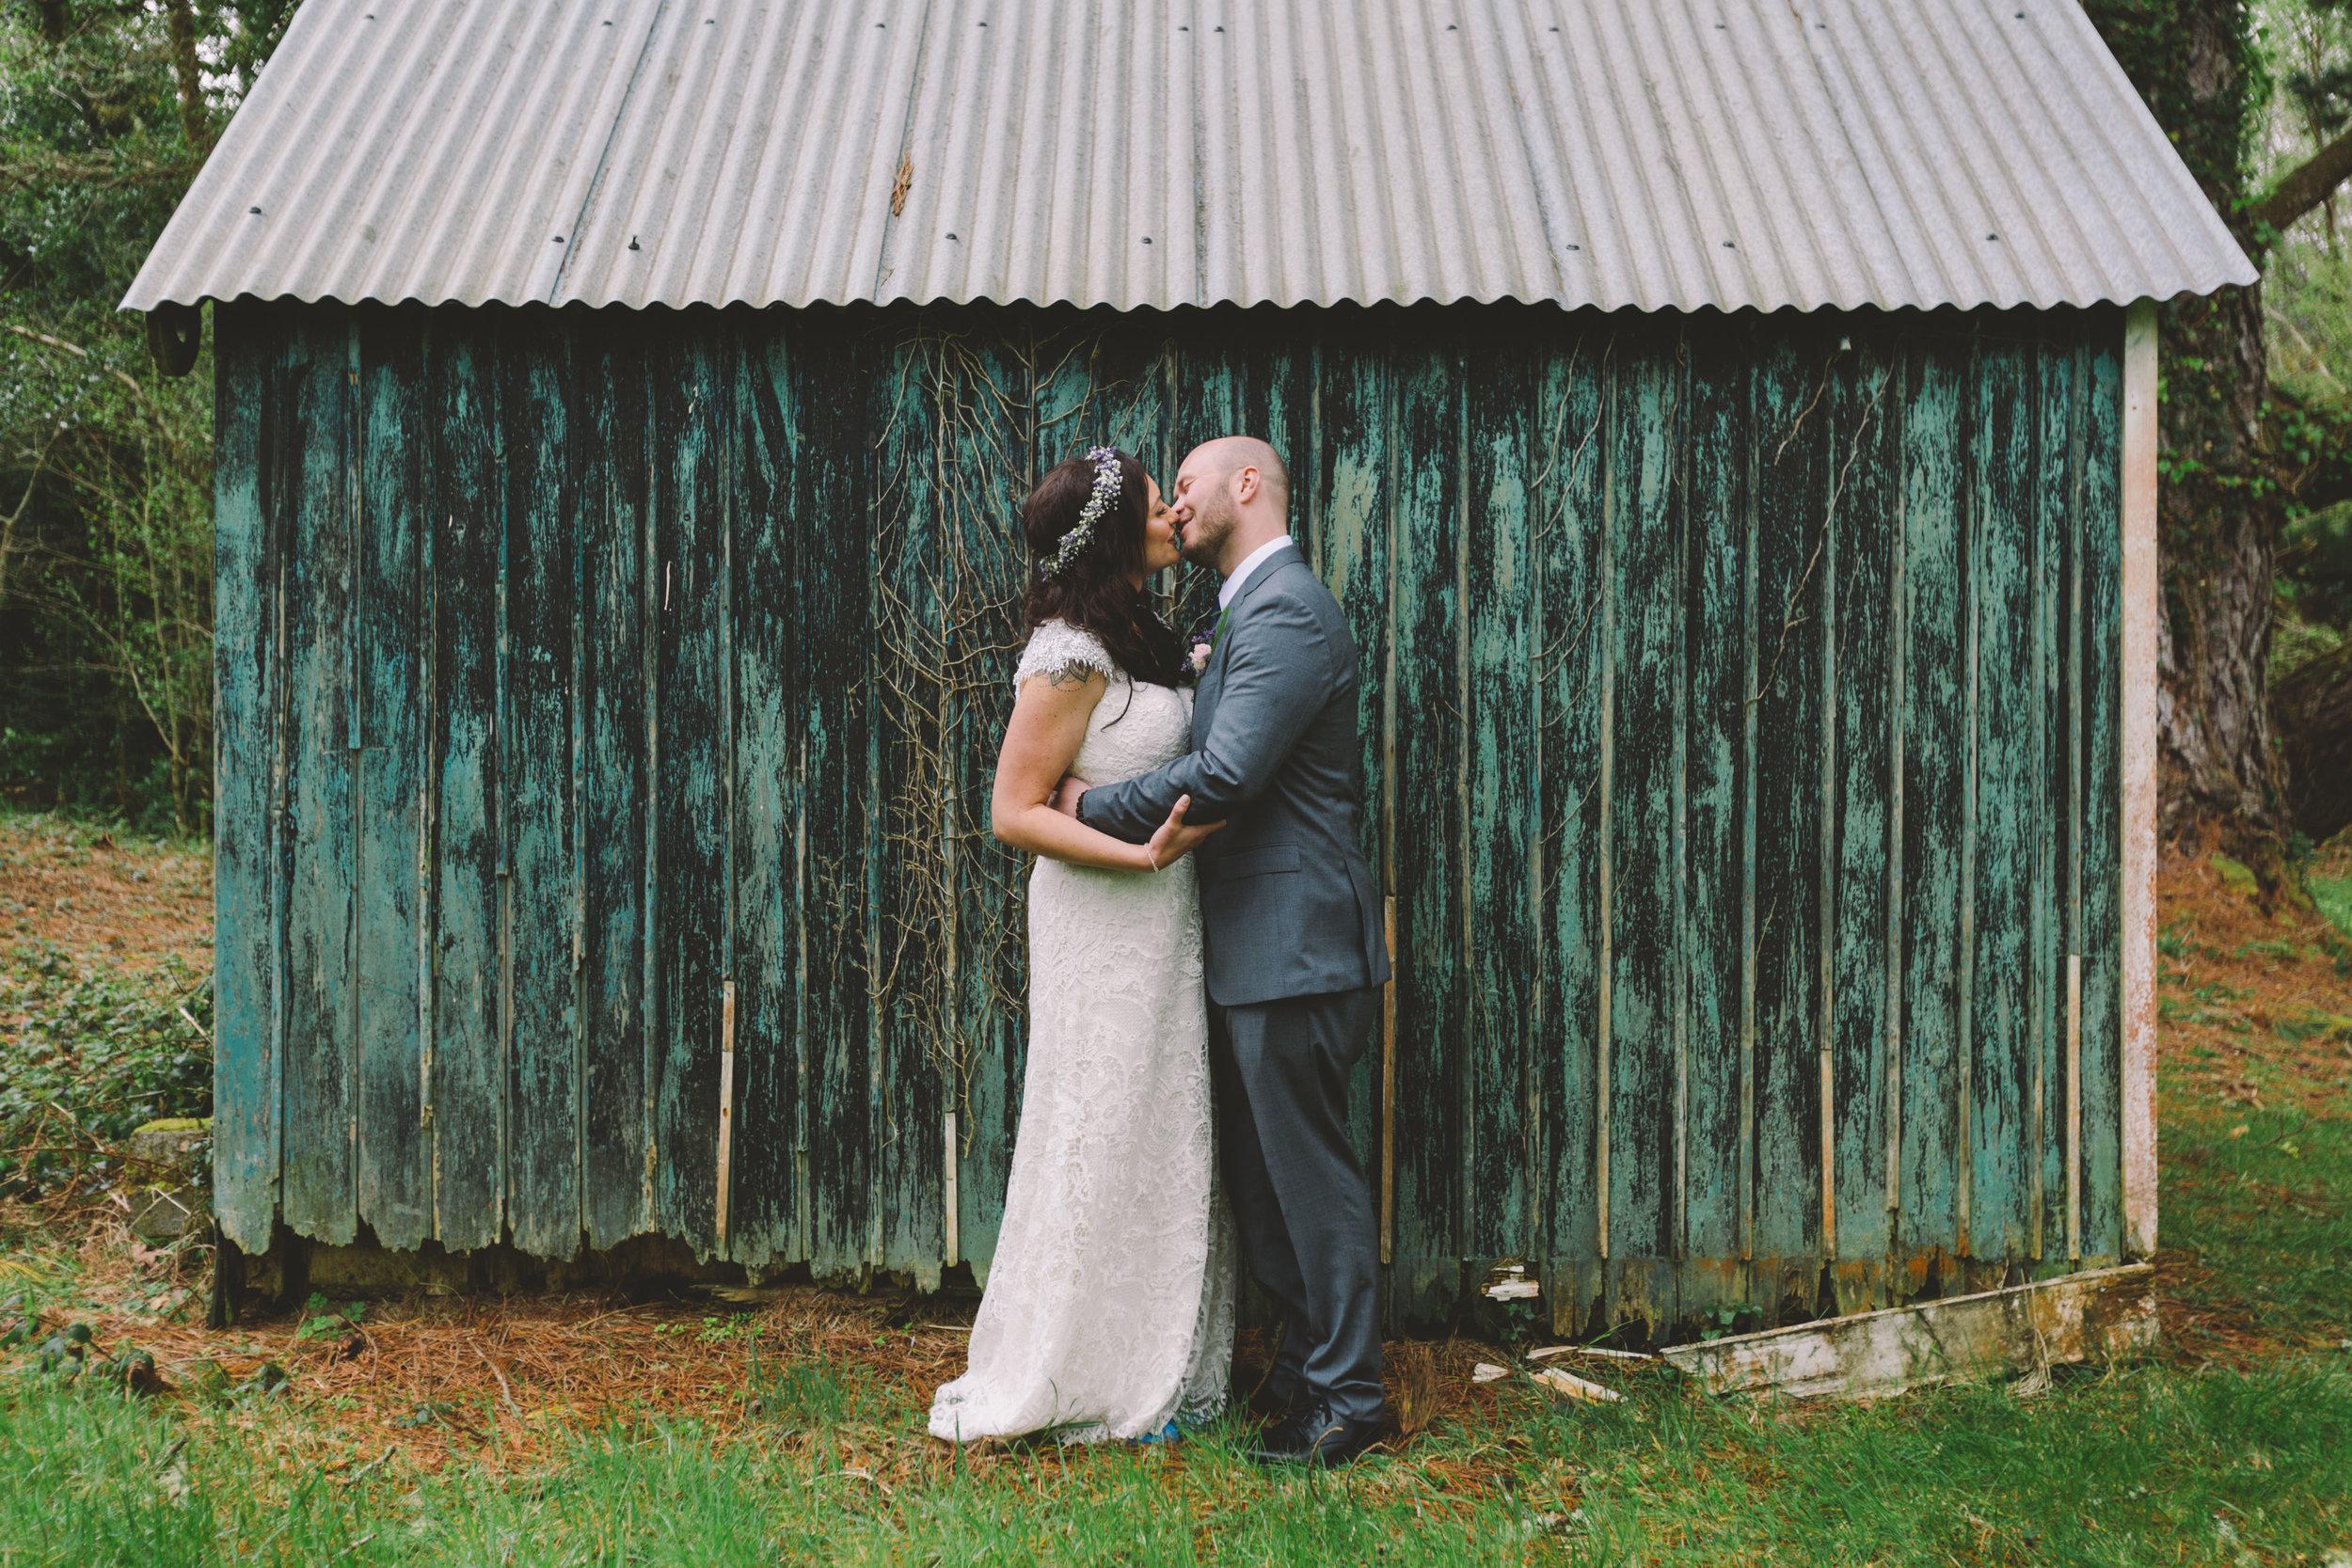 Makaela & Brendan - Photography-103.jpg